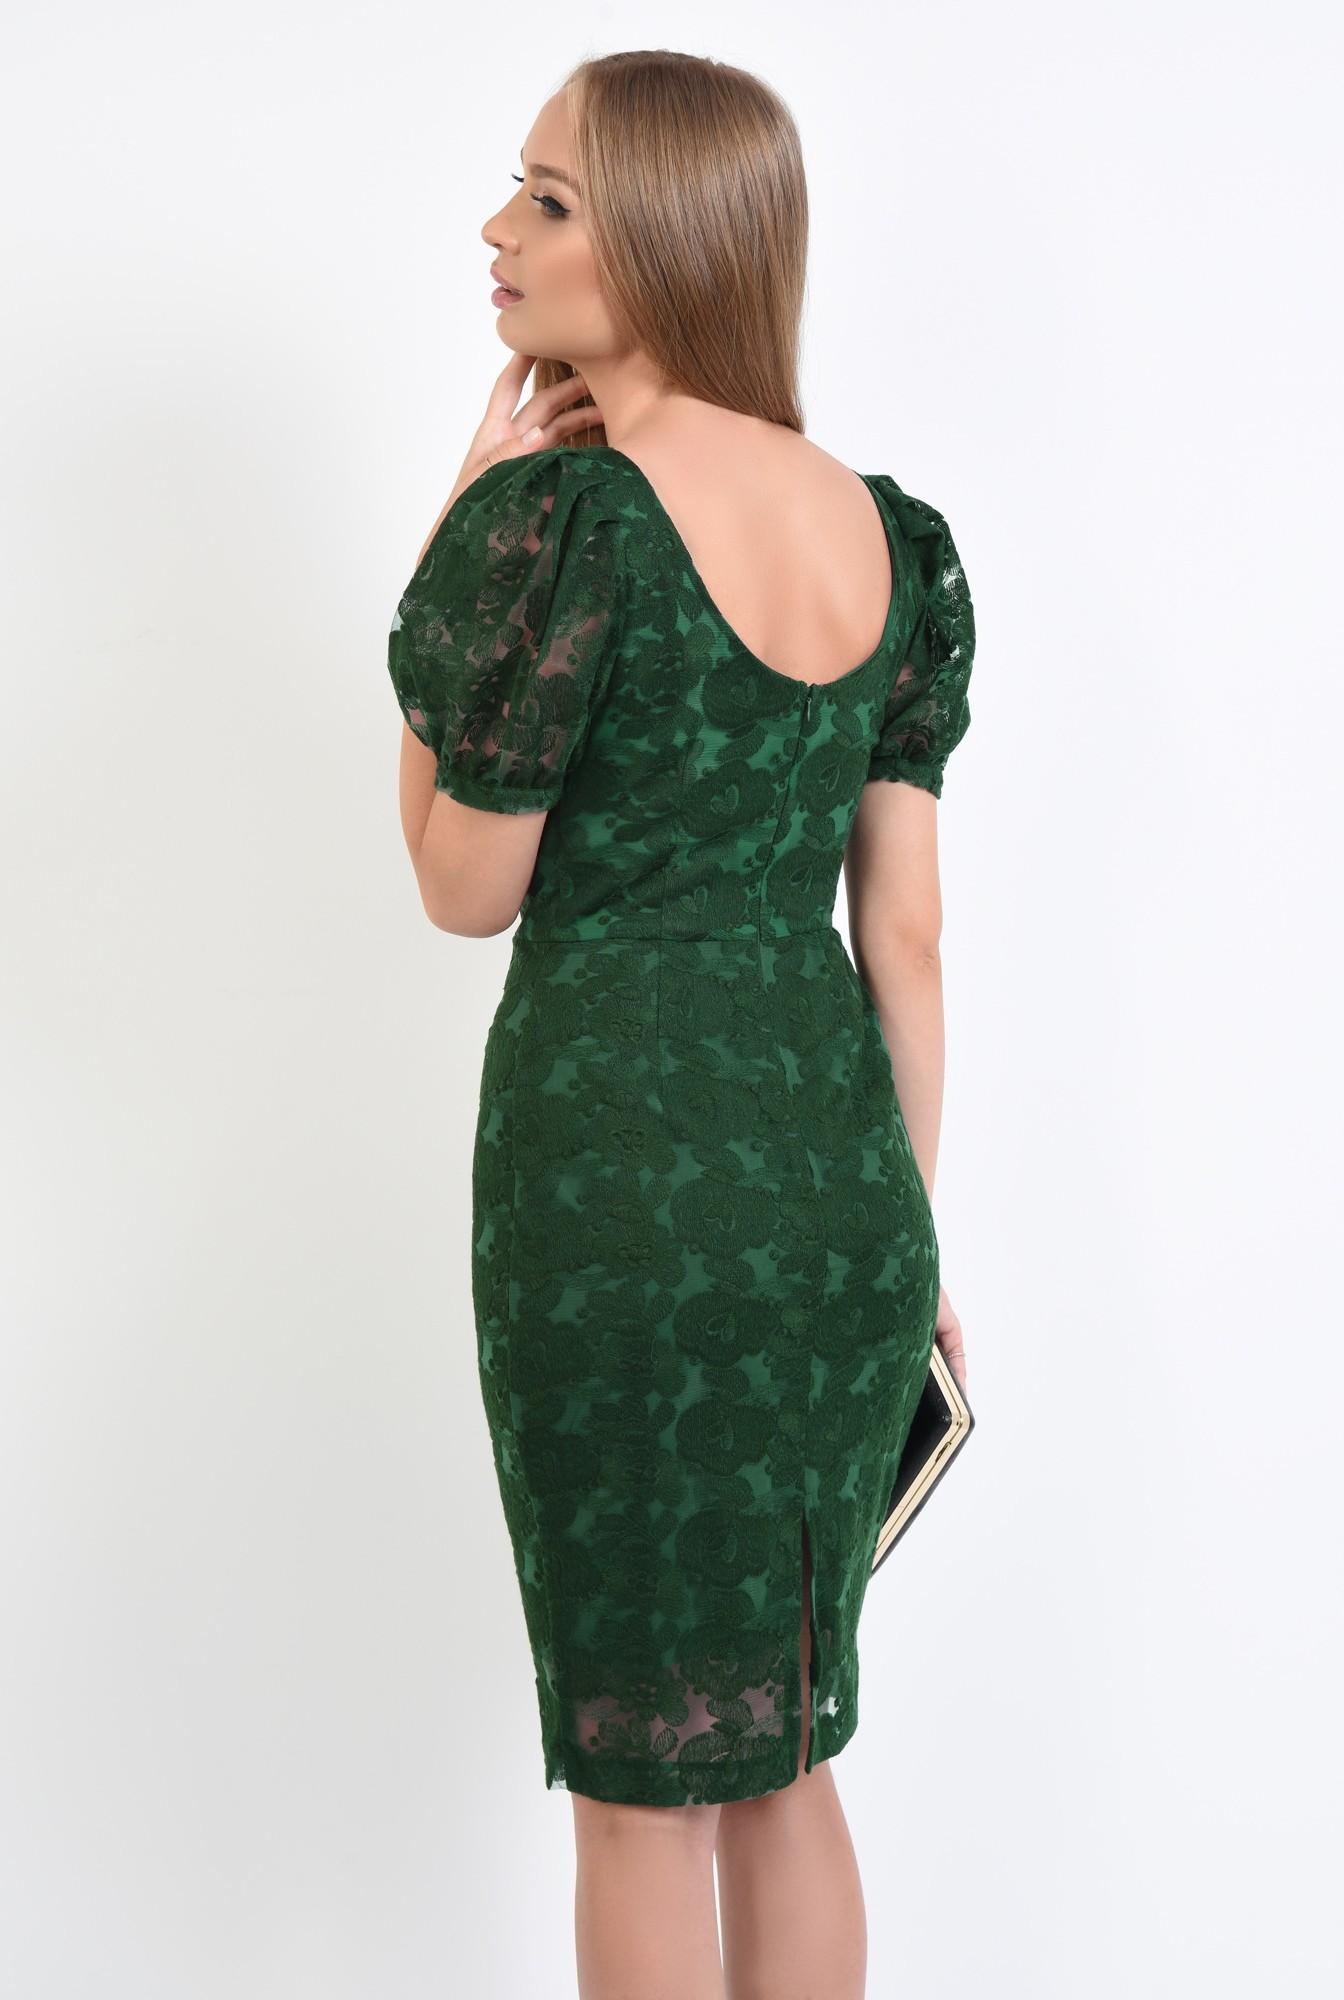 1 - rochie de seara, dantela, verde smarald, midi